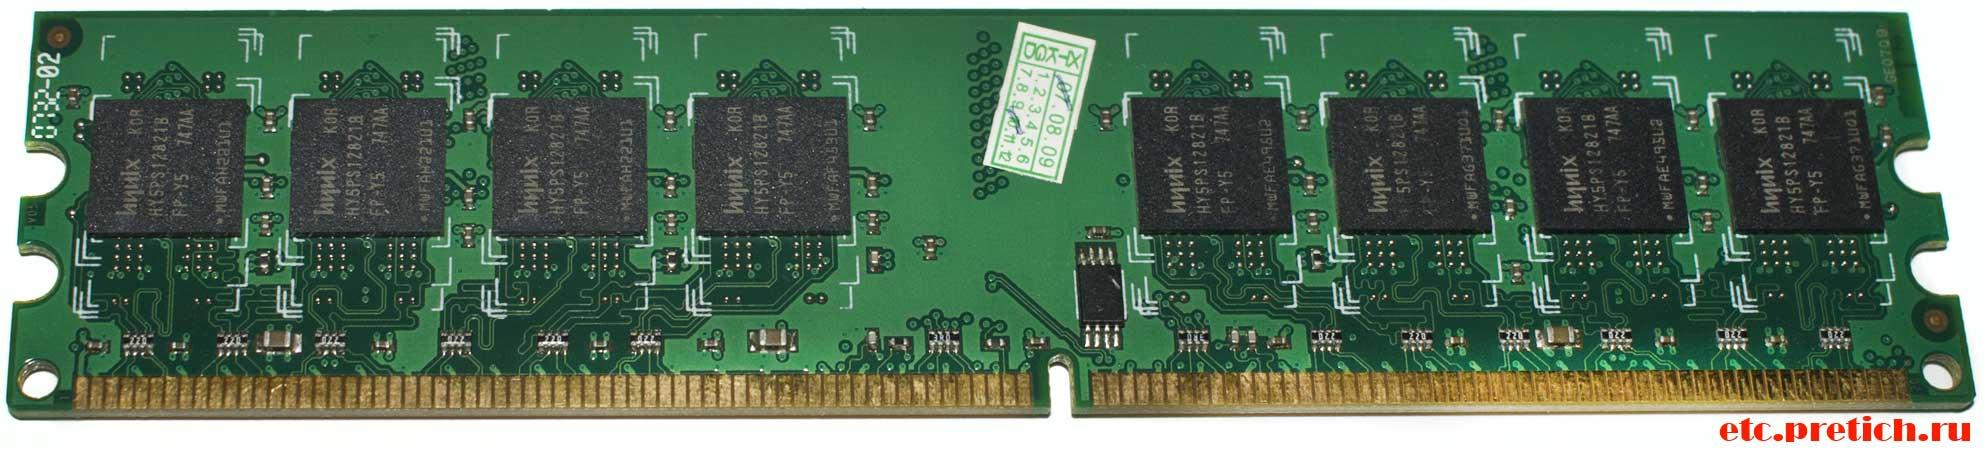 Kingston KVR667D2N5/1G оперативная память DDR2 куда применить?